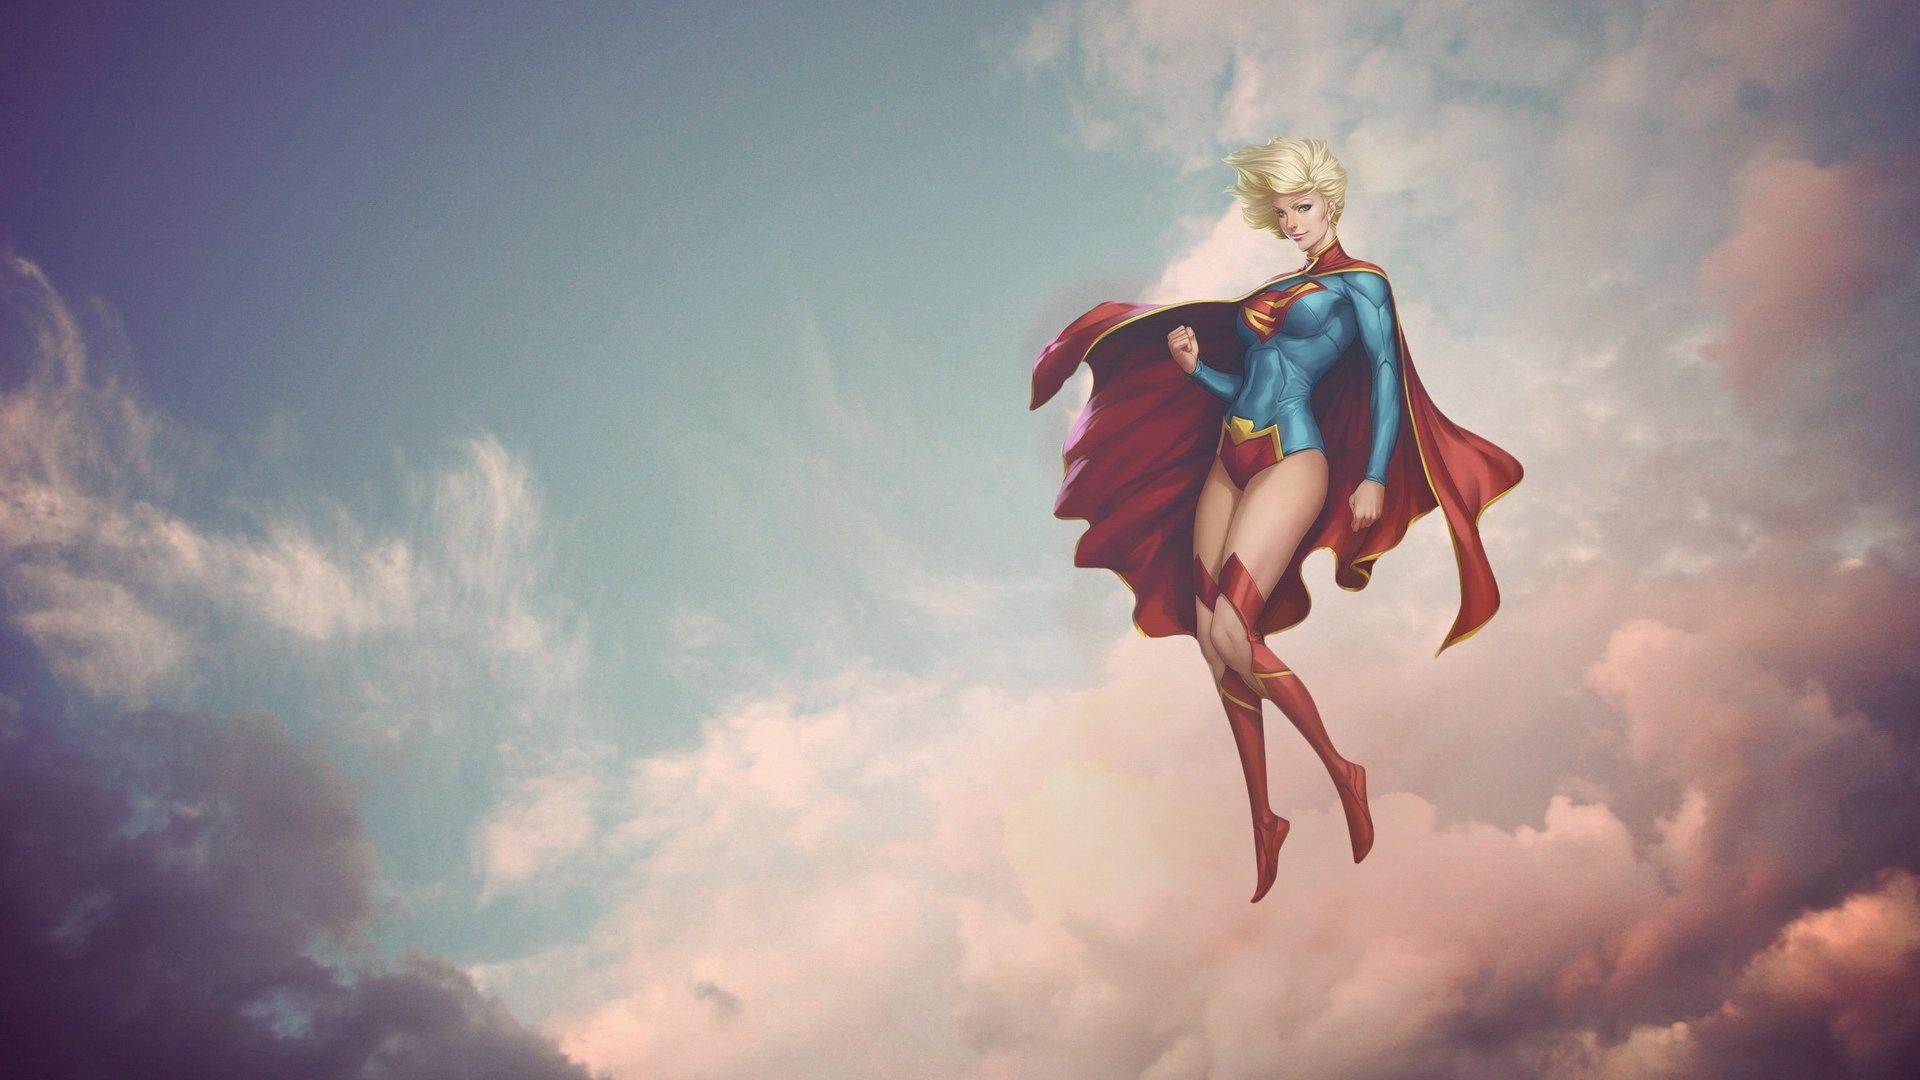 Supergirl cool wallpaper